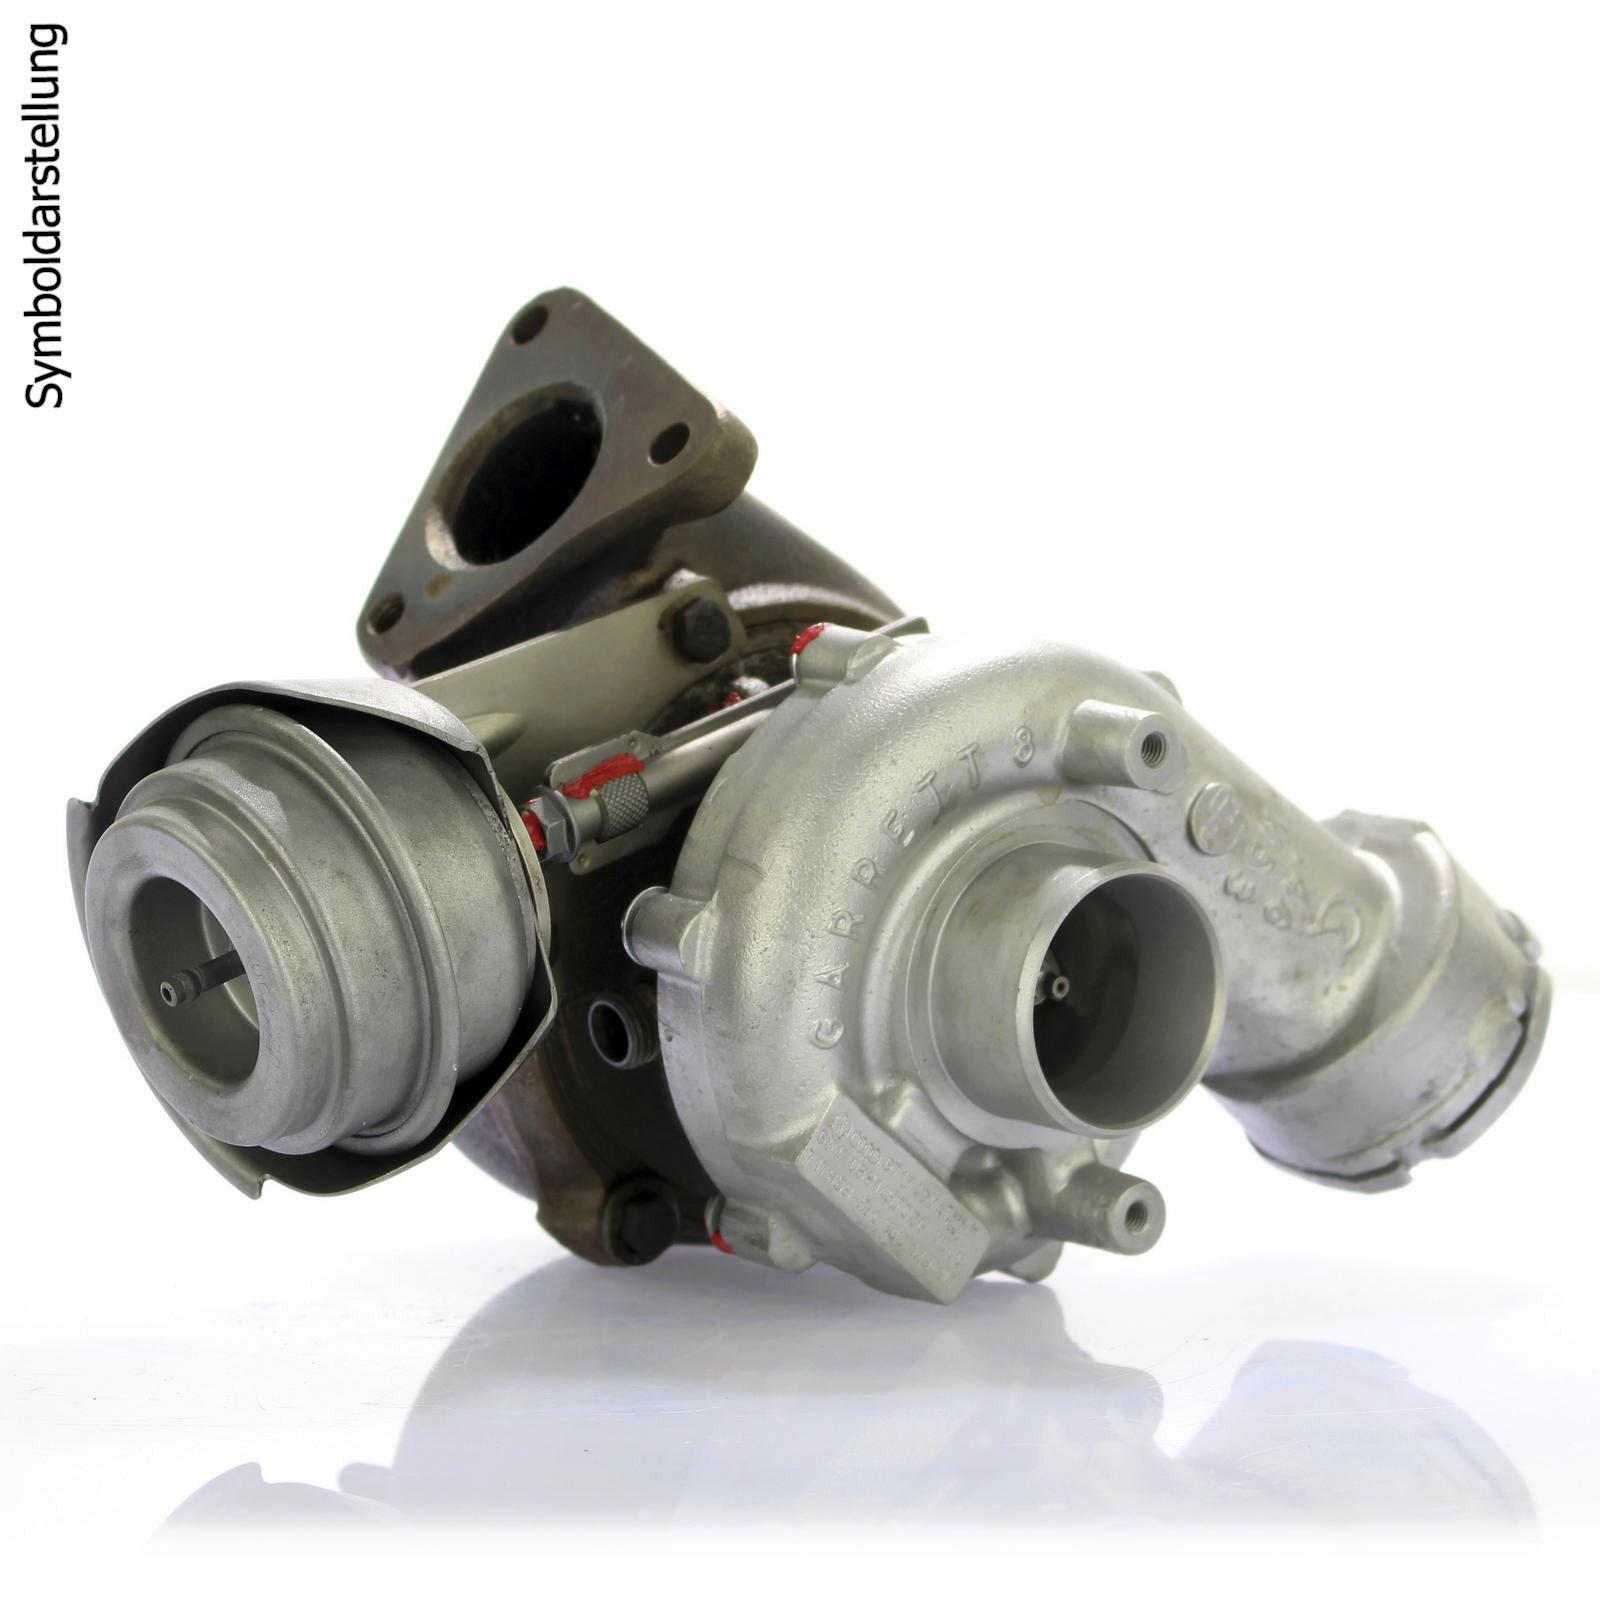 BTS Turbo Turbolader / Lader Aufladung TURBO SERVICE SET BLUE TURBO